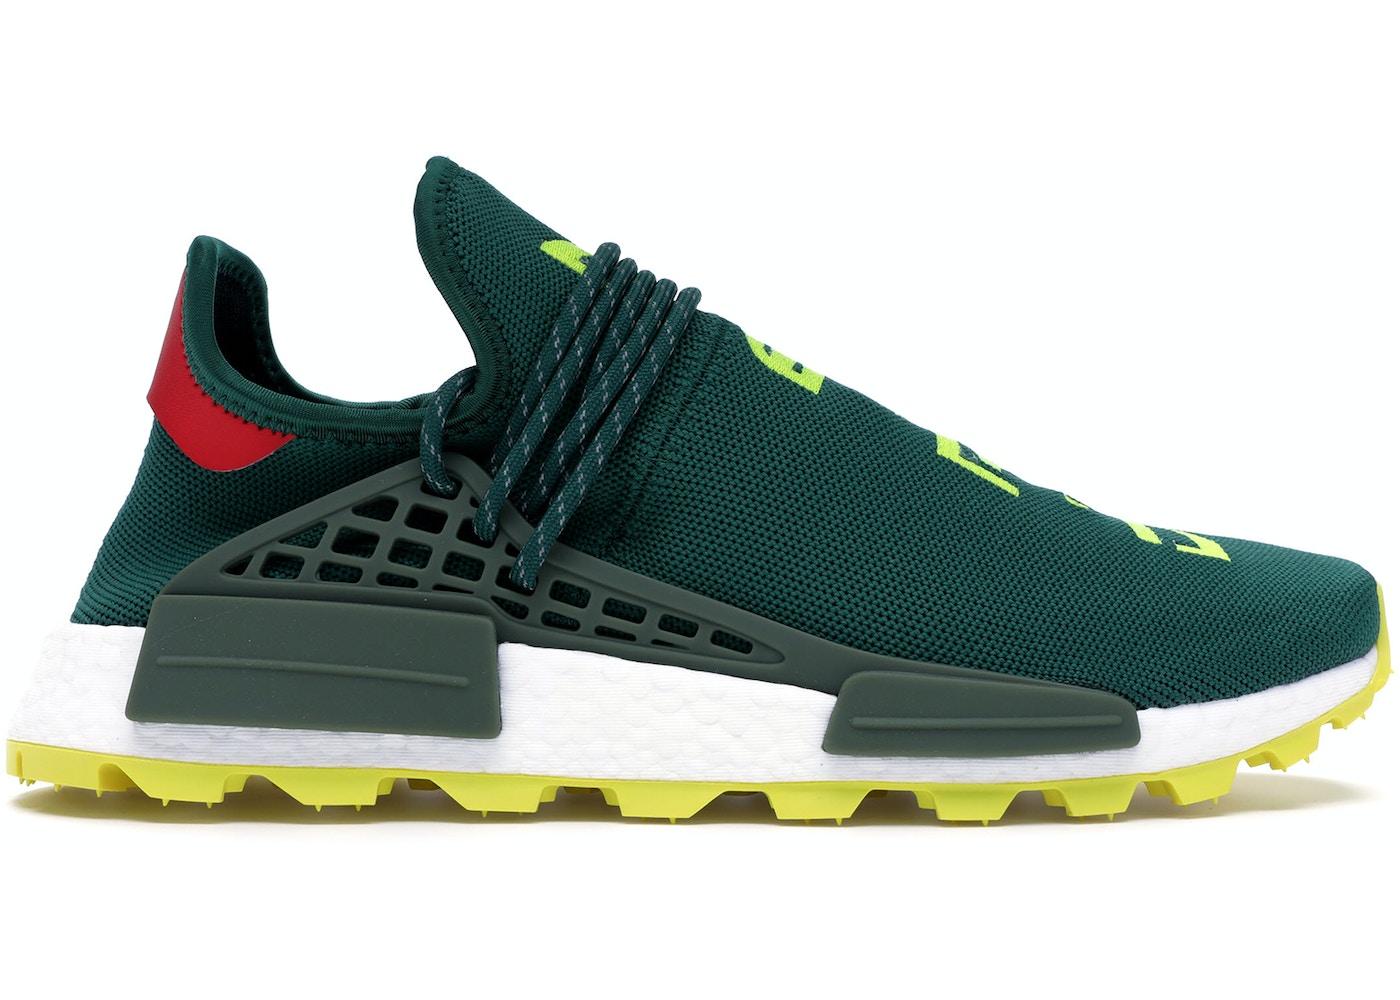 new style 0850a a1138 adidas NMD Hu Pharrell NERD Green Yellow